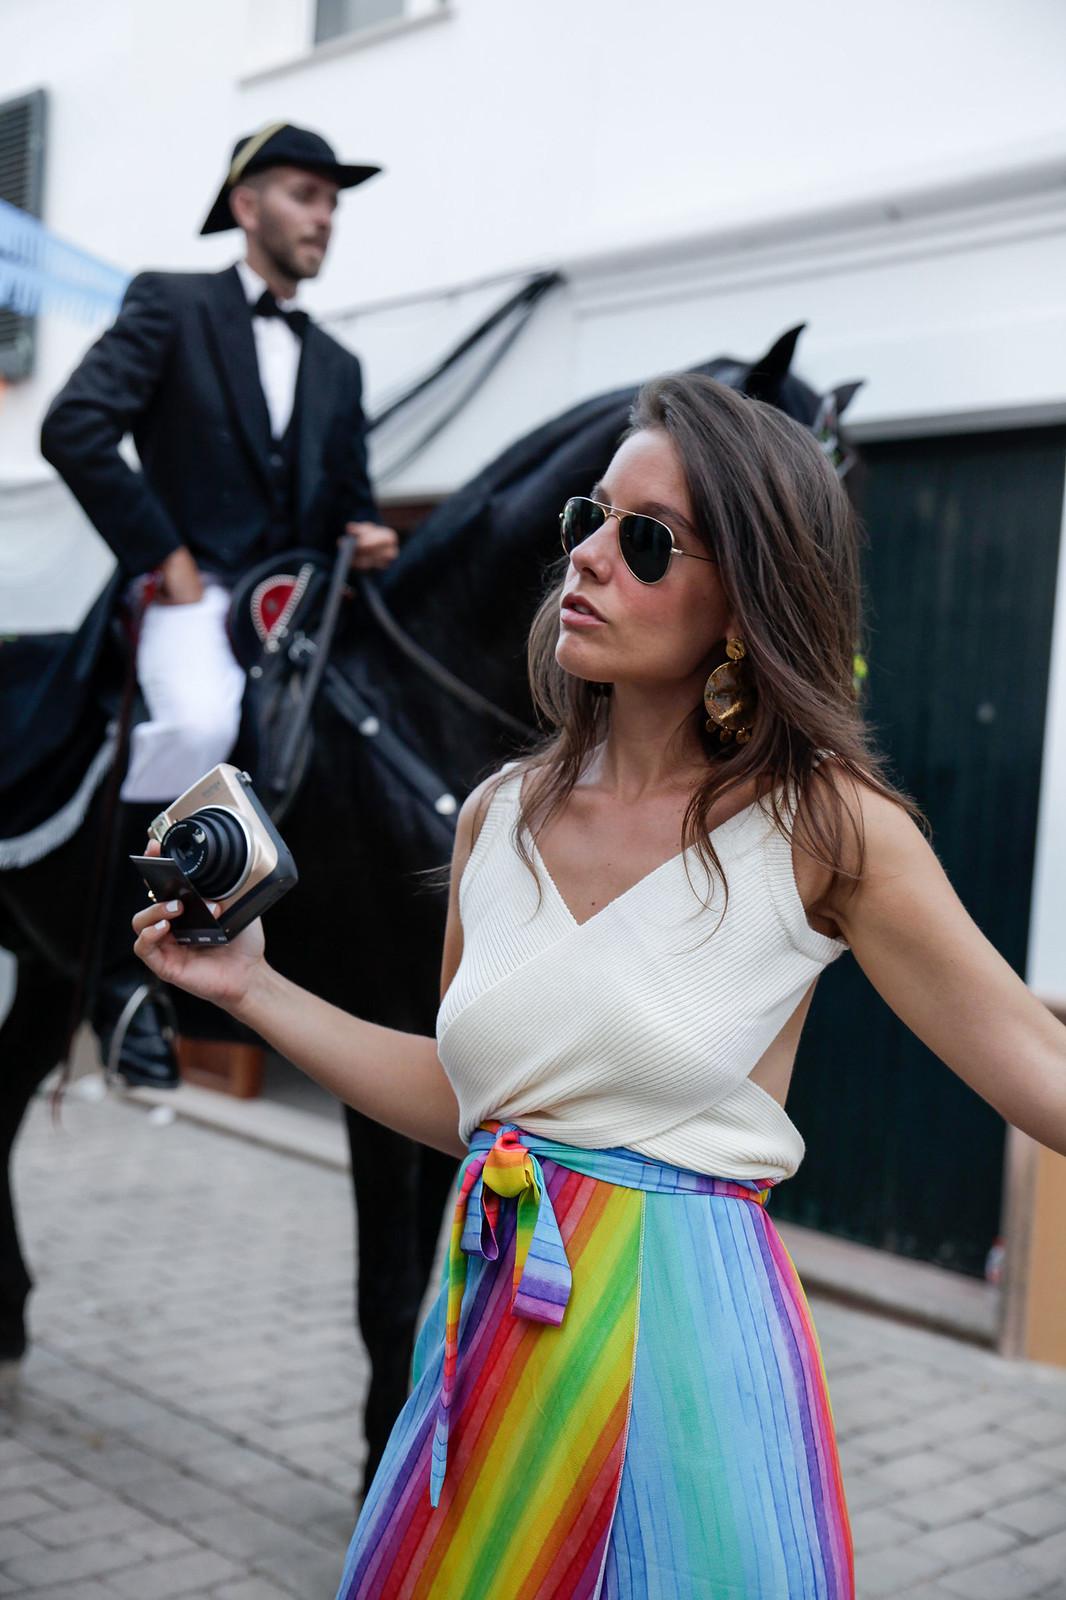 016_falda_arcoiris_top_crudo_look_fiestas_menorca_verano_theguestgirl_fashion_blogger_minorca_summer_laura_santolaria_rayban_sunglasses